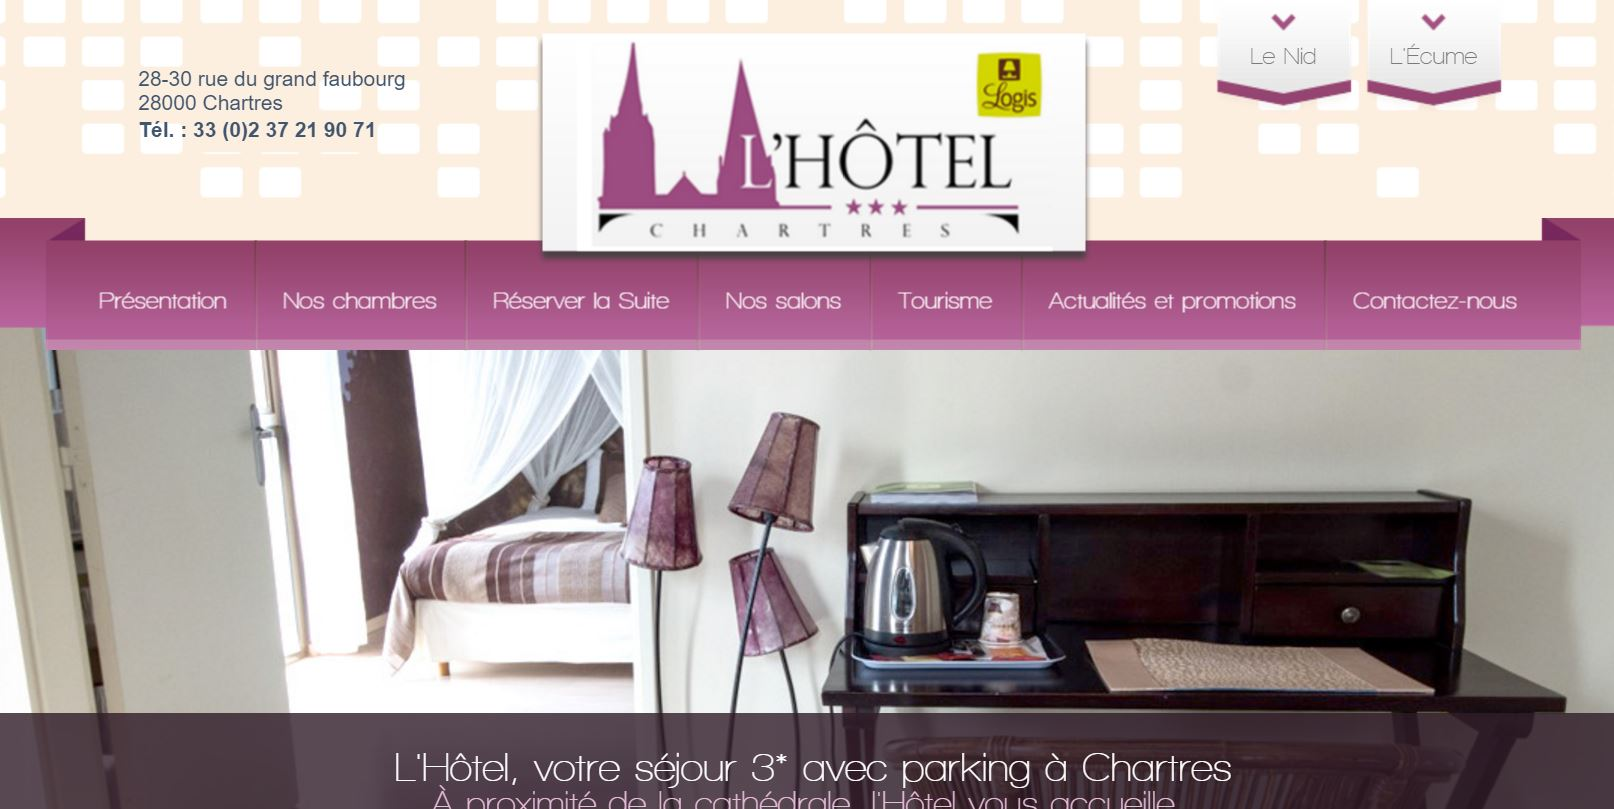 L'Hôtel à Chartres